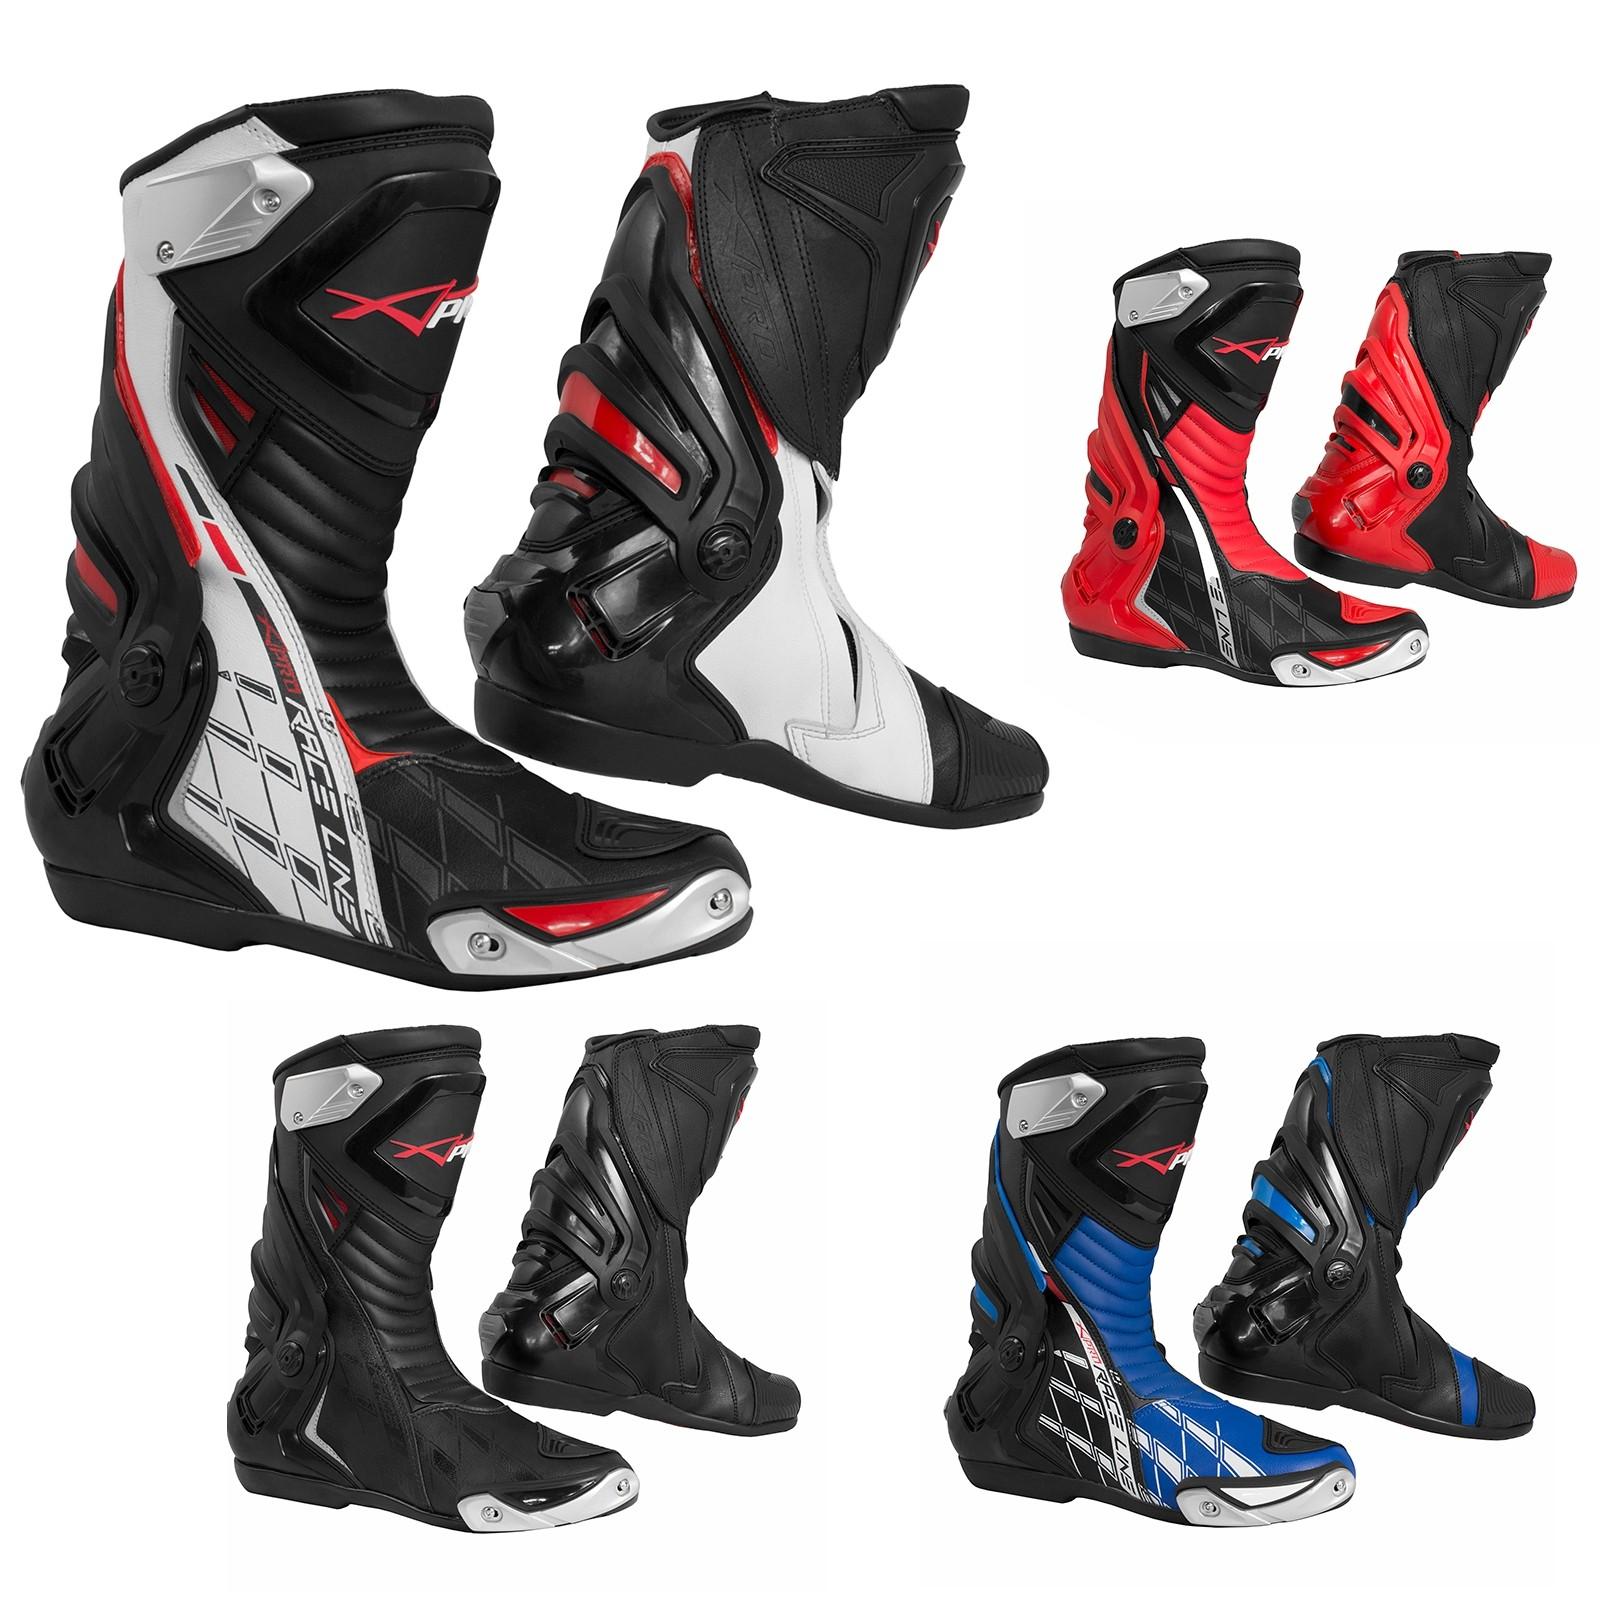 Supertech-Boots-Stivali-Motorcycle-A-Pro-Sonic-Moto-Super-Set